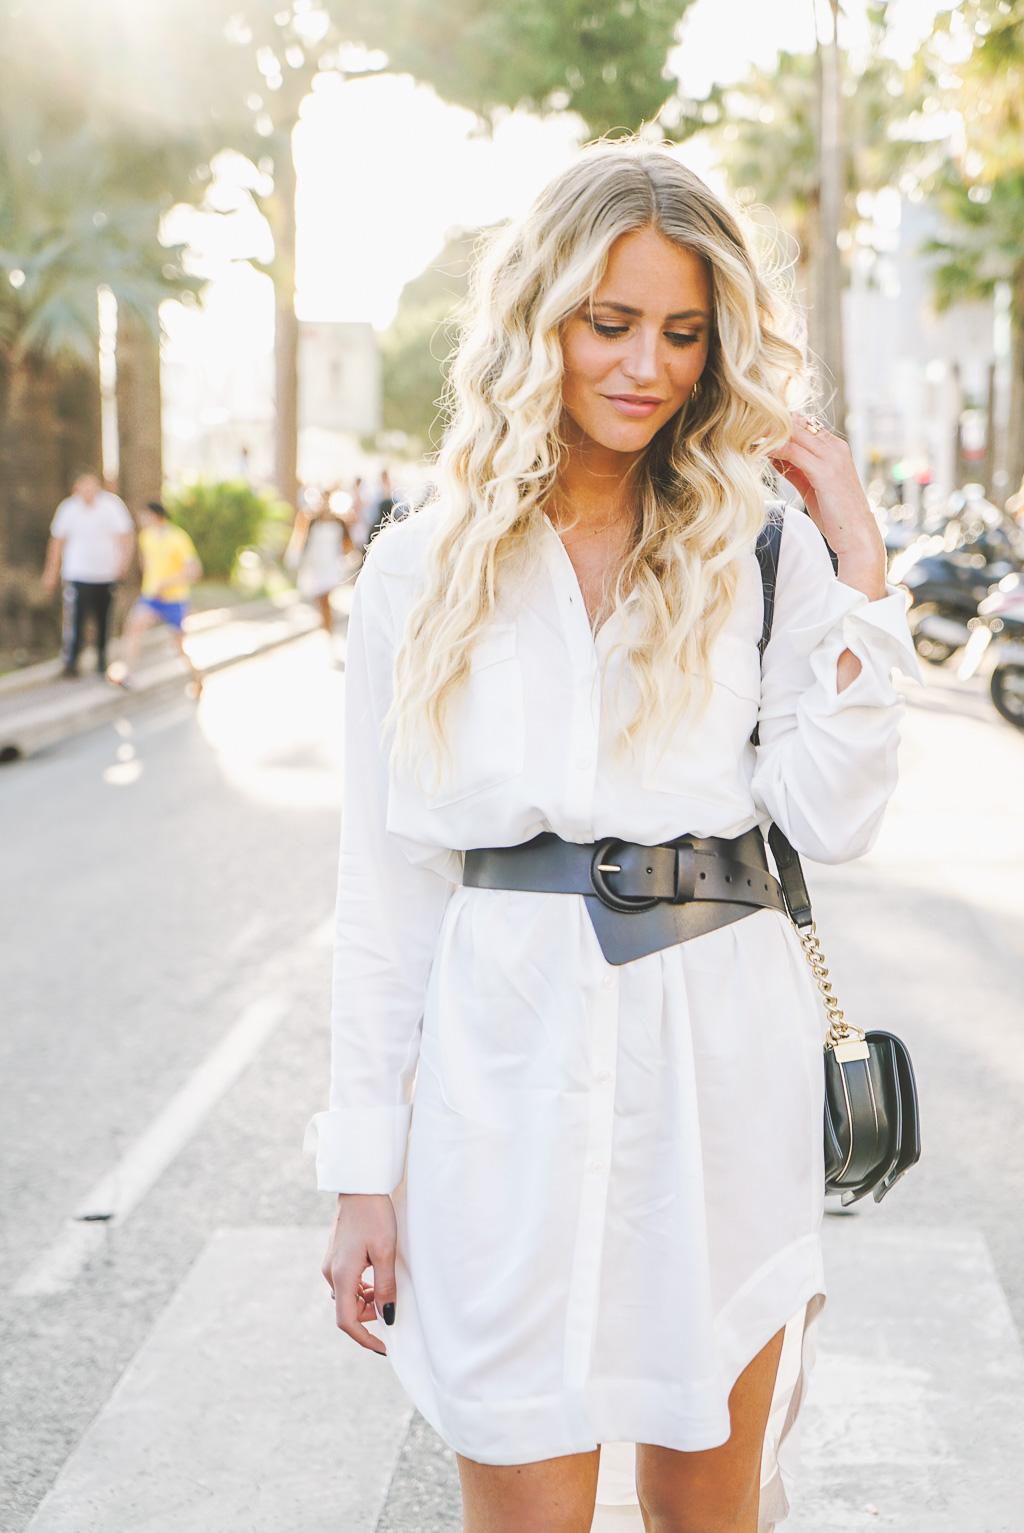 janni-deler-white-shirtDSC00421